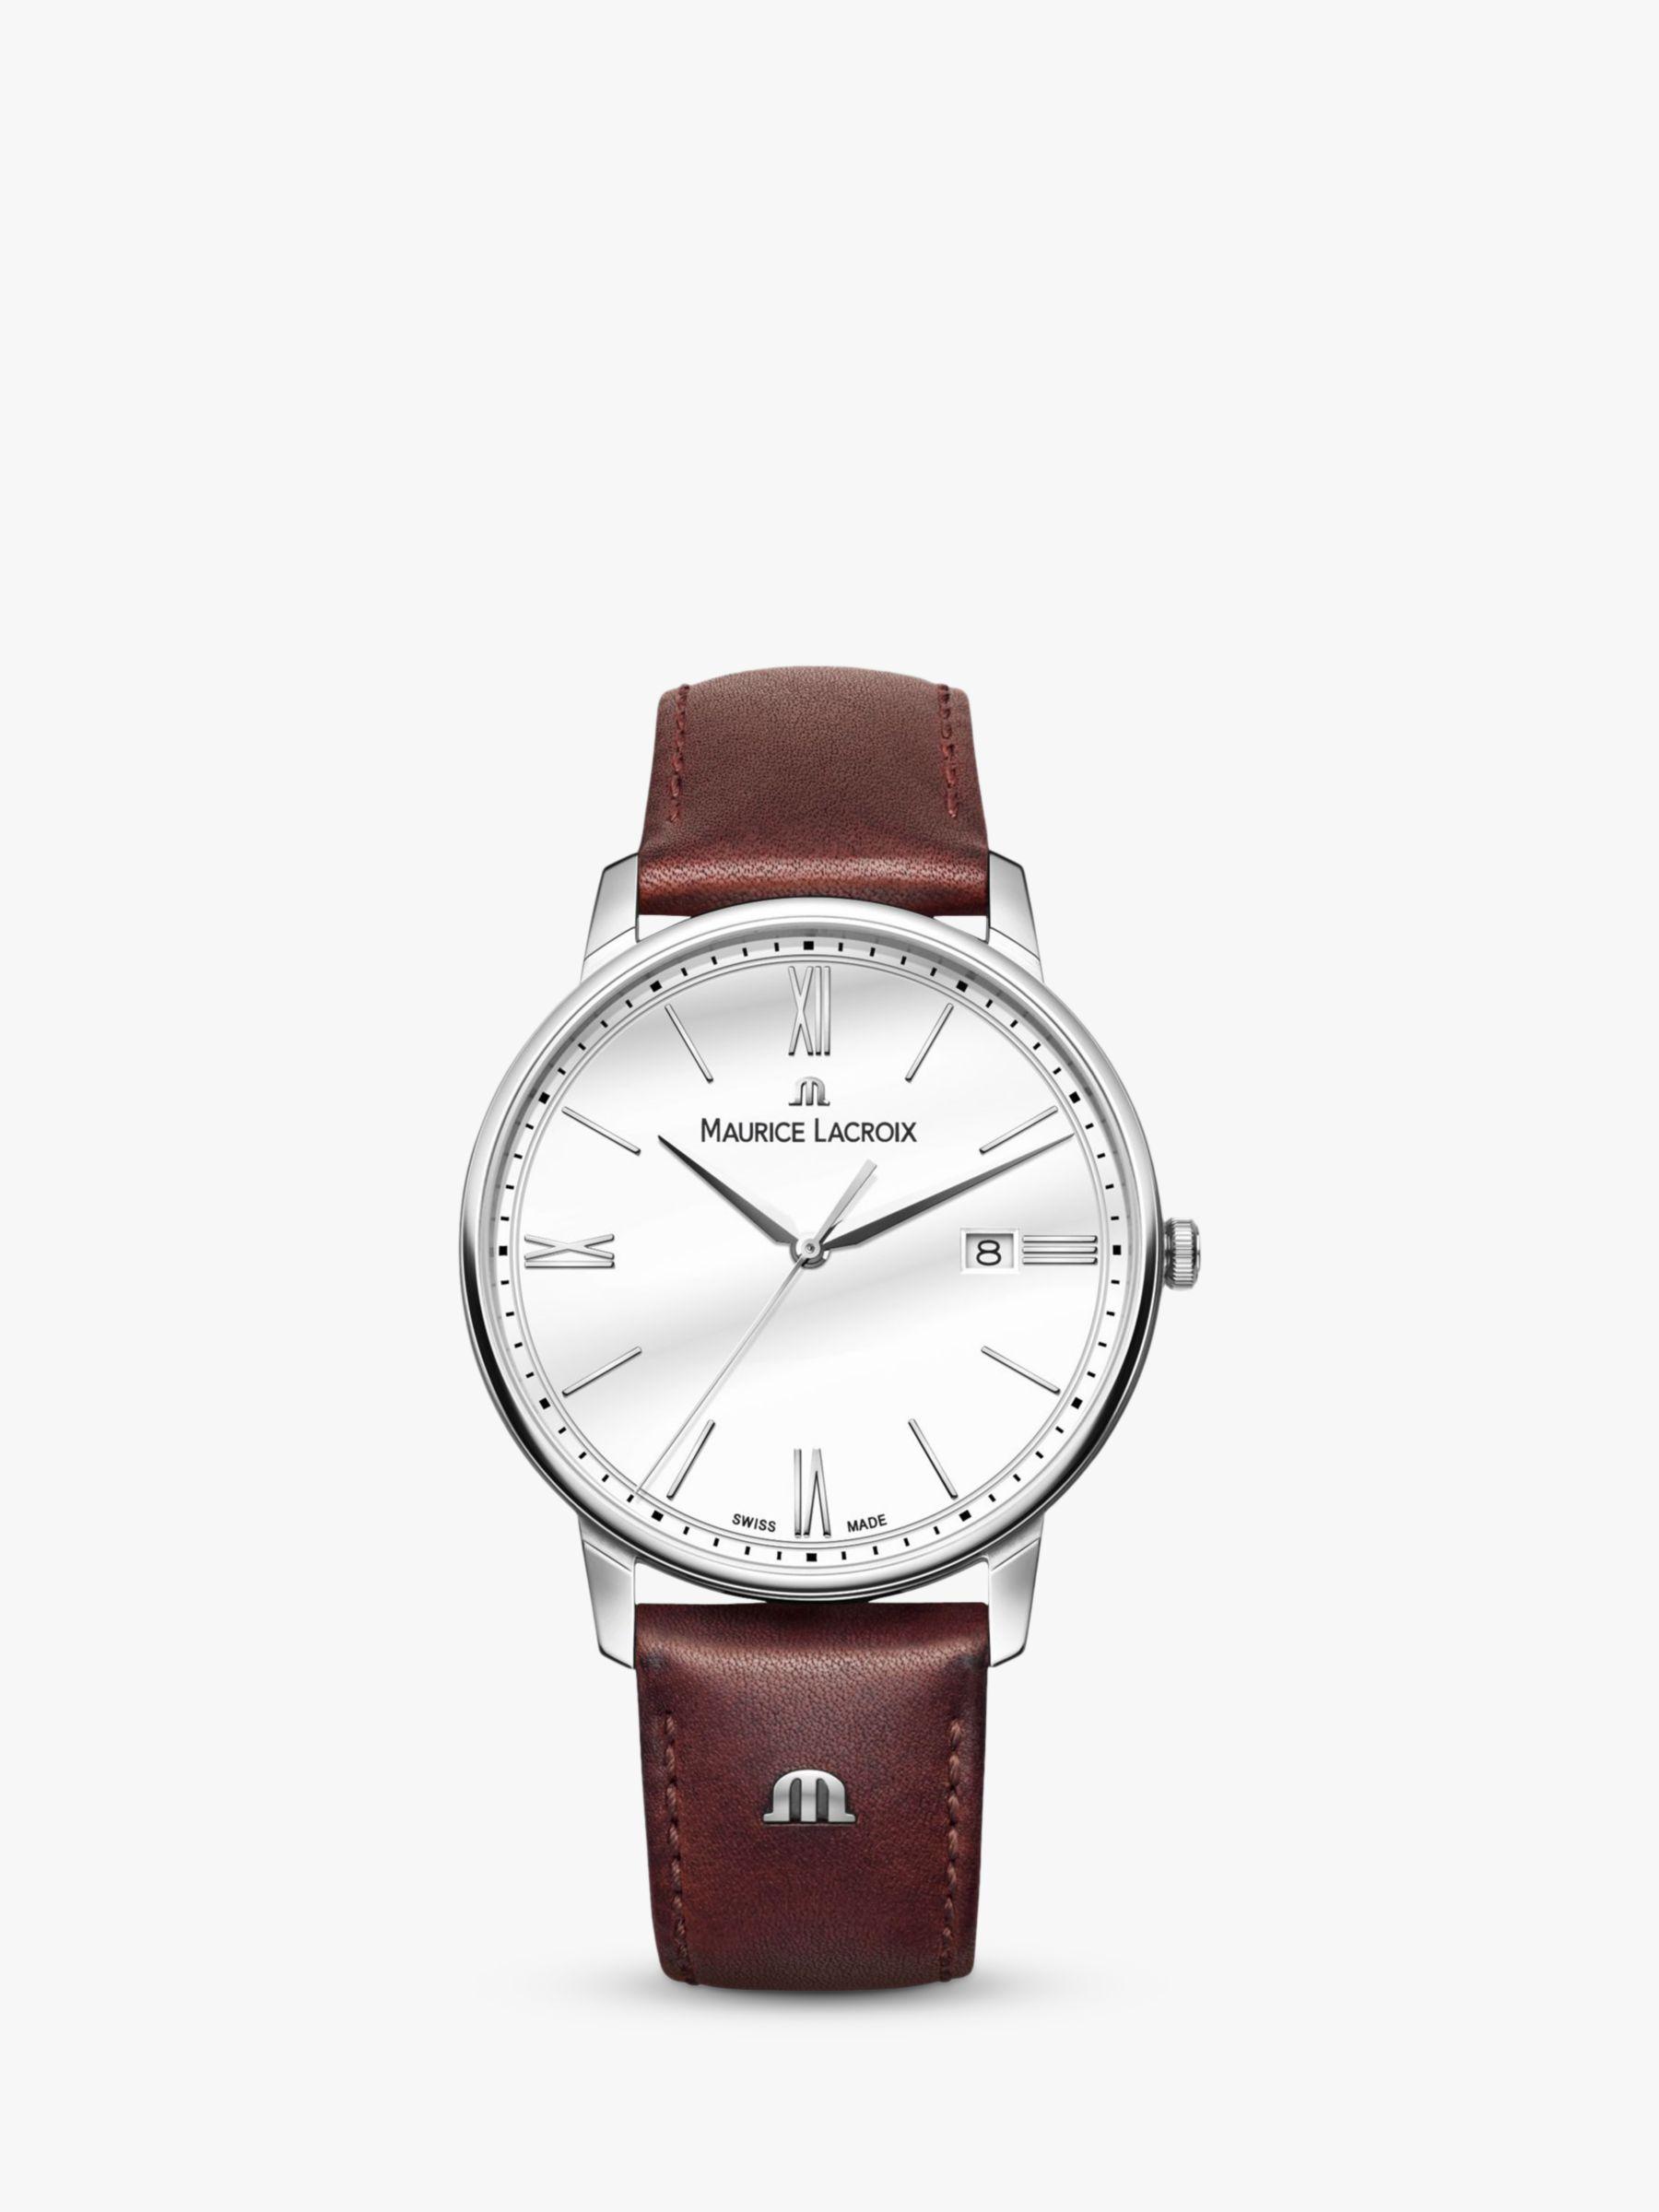 Maurice Lacroix Maurice Lacroix EL1118-SS001-113-1 Men's Eliros Date Leather Strap Watch, Dark Brown/White